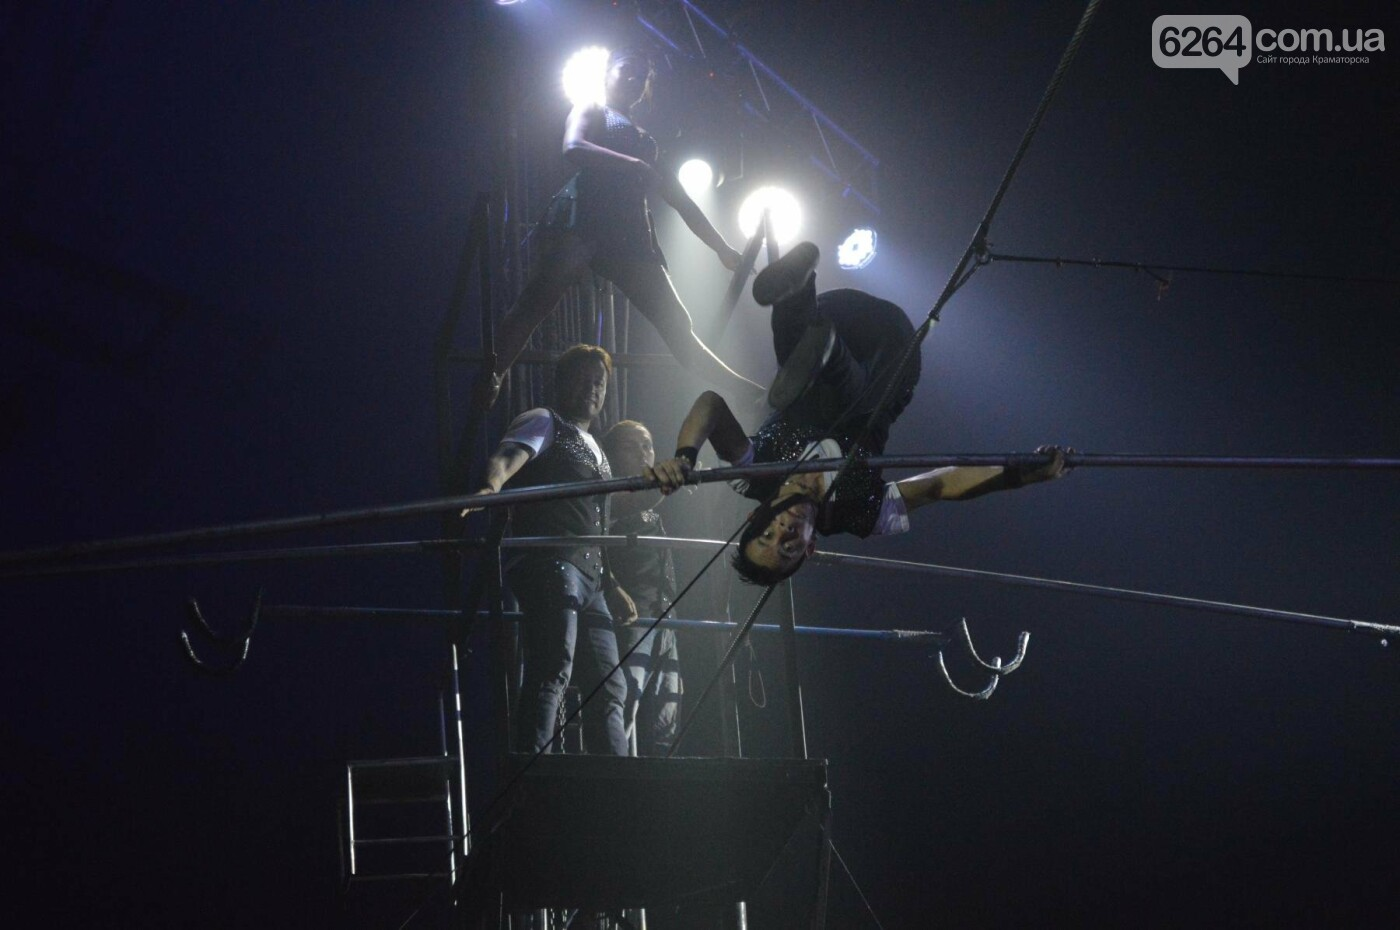 Новое шоу цирка «Кобзов» произвело фурор в Краматорске, фото-9